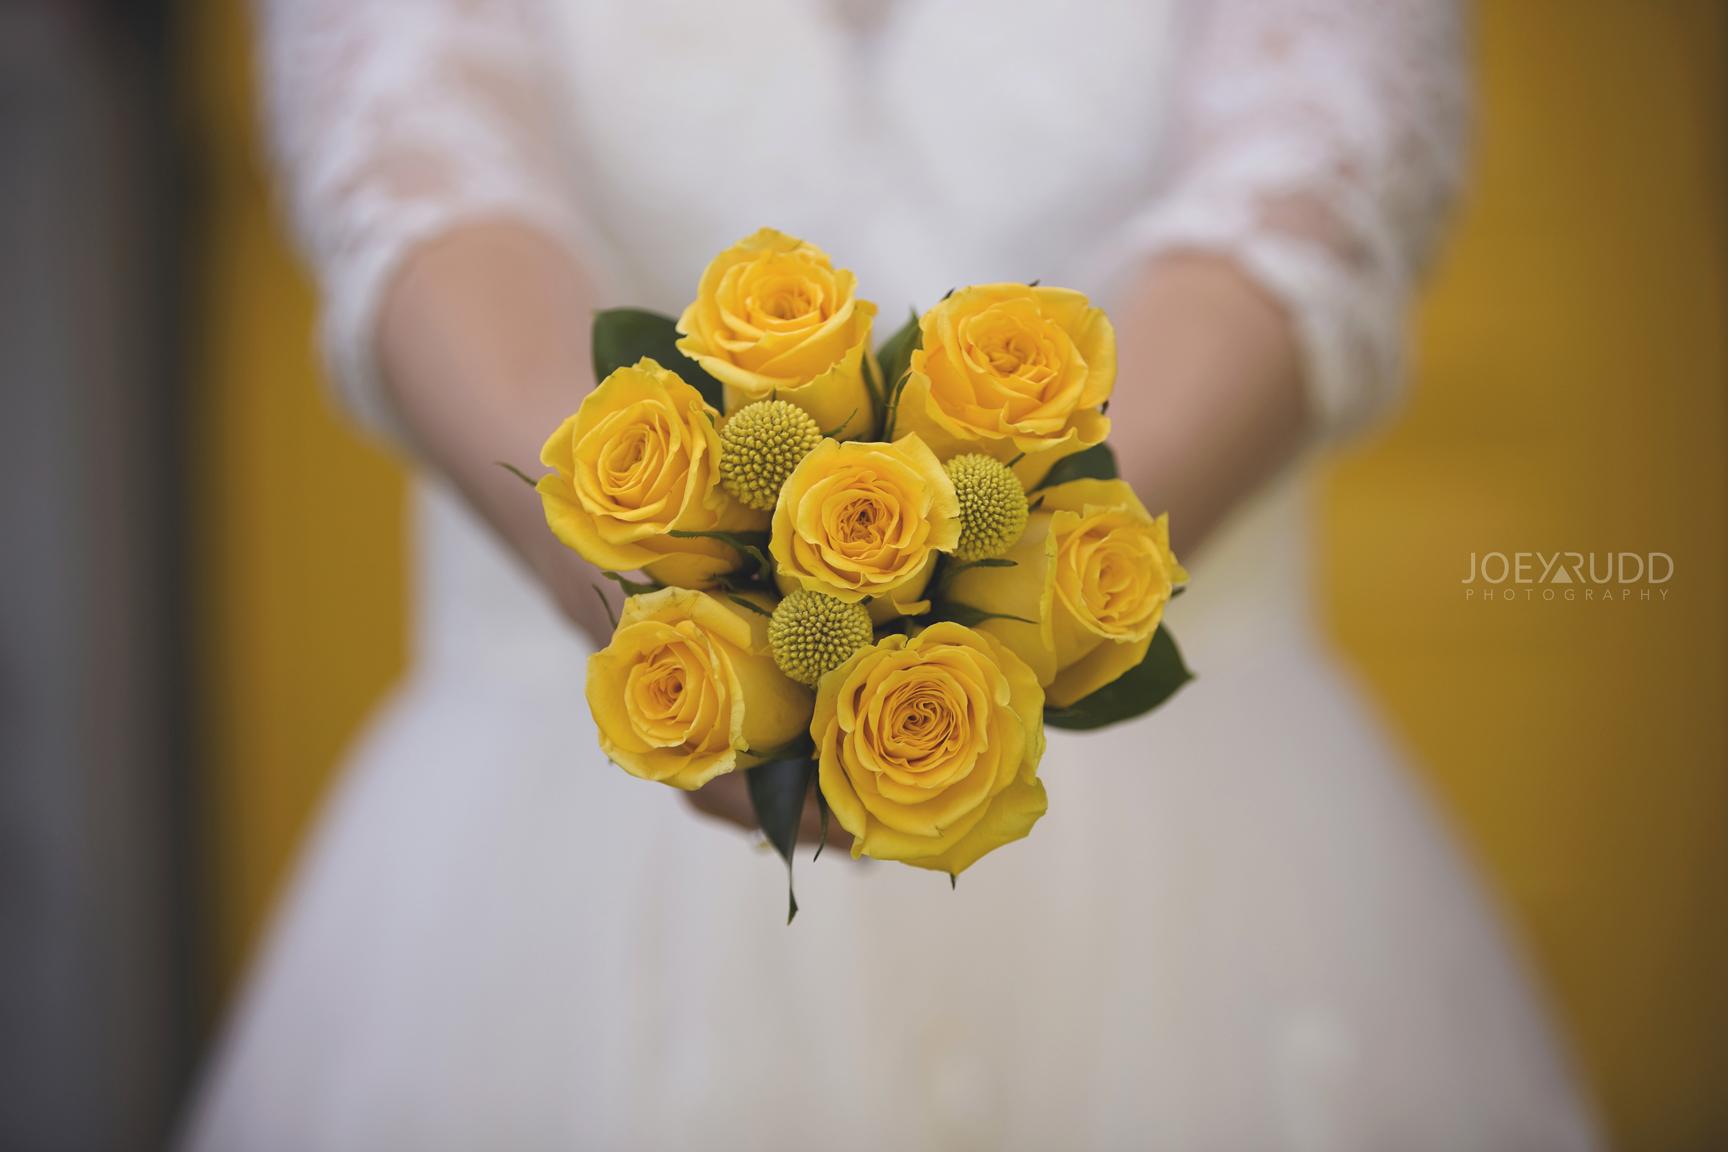 Ottawa Elopement by Joey Rudd Photography Ottawa Wedding Photographer Mer Bleue Ottawa Wedding Chapel Bouquet